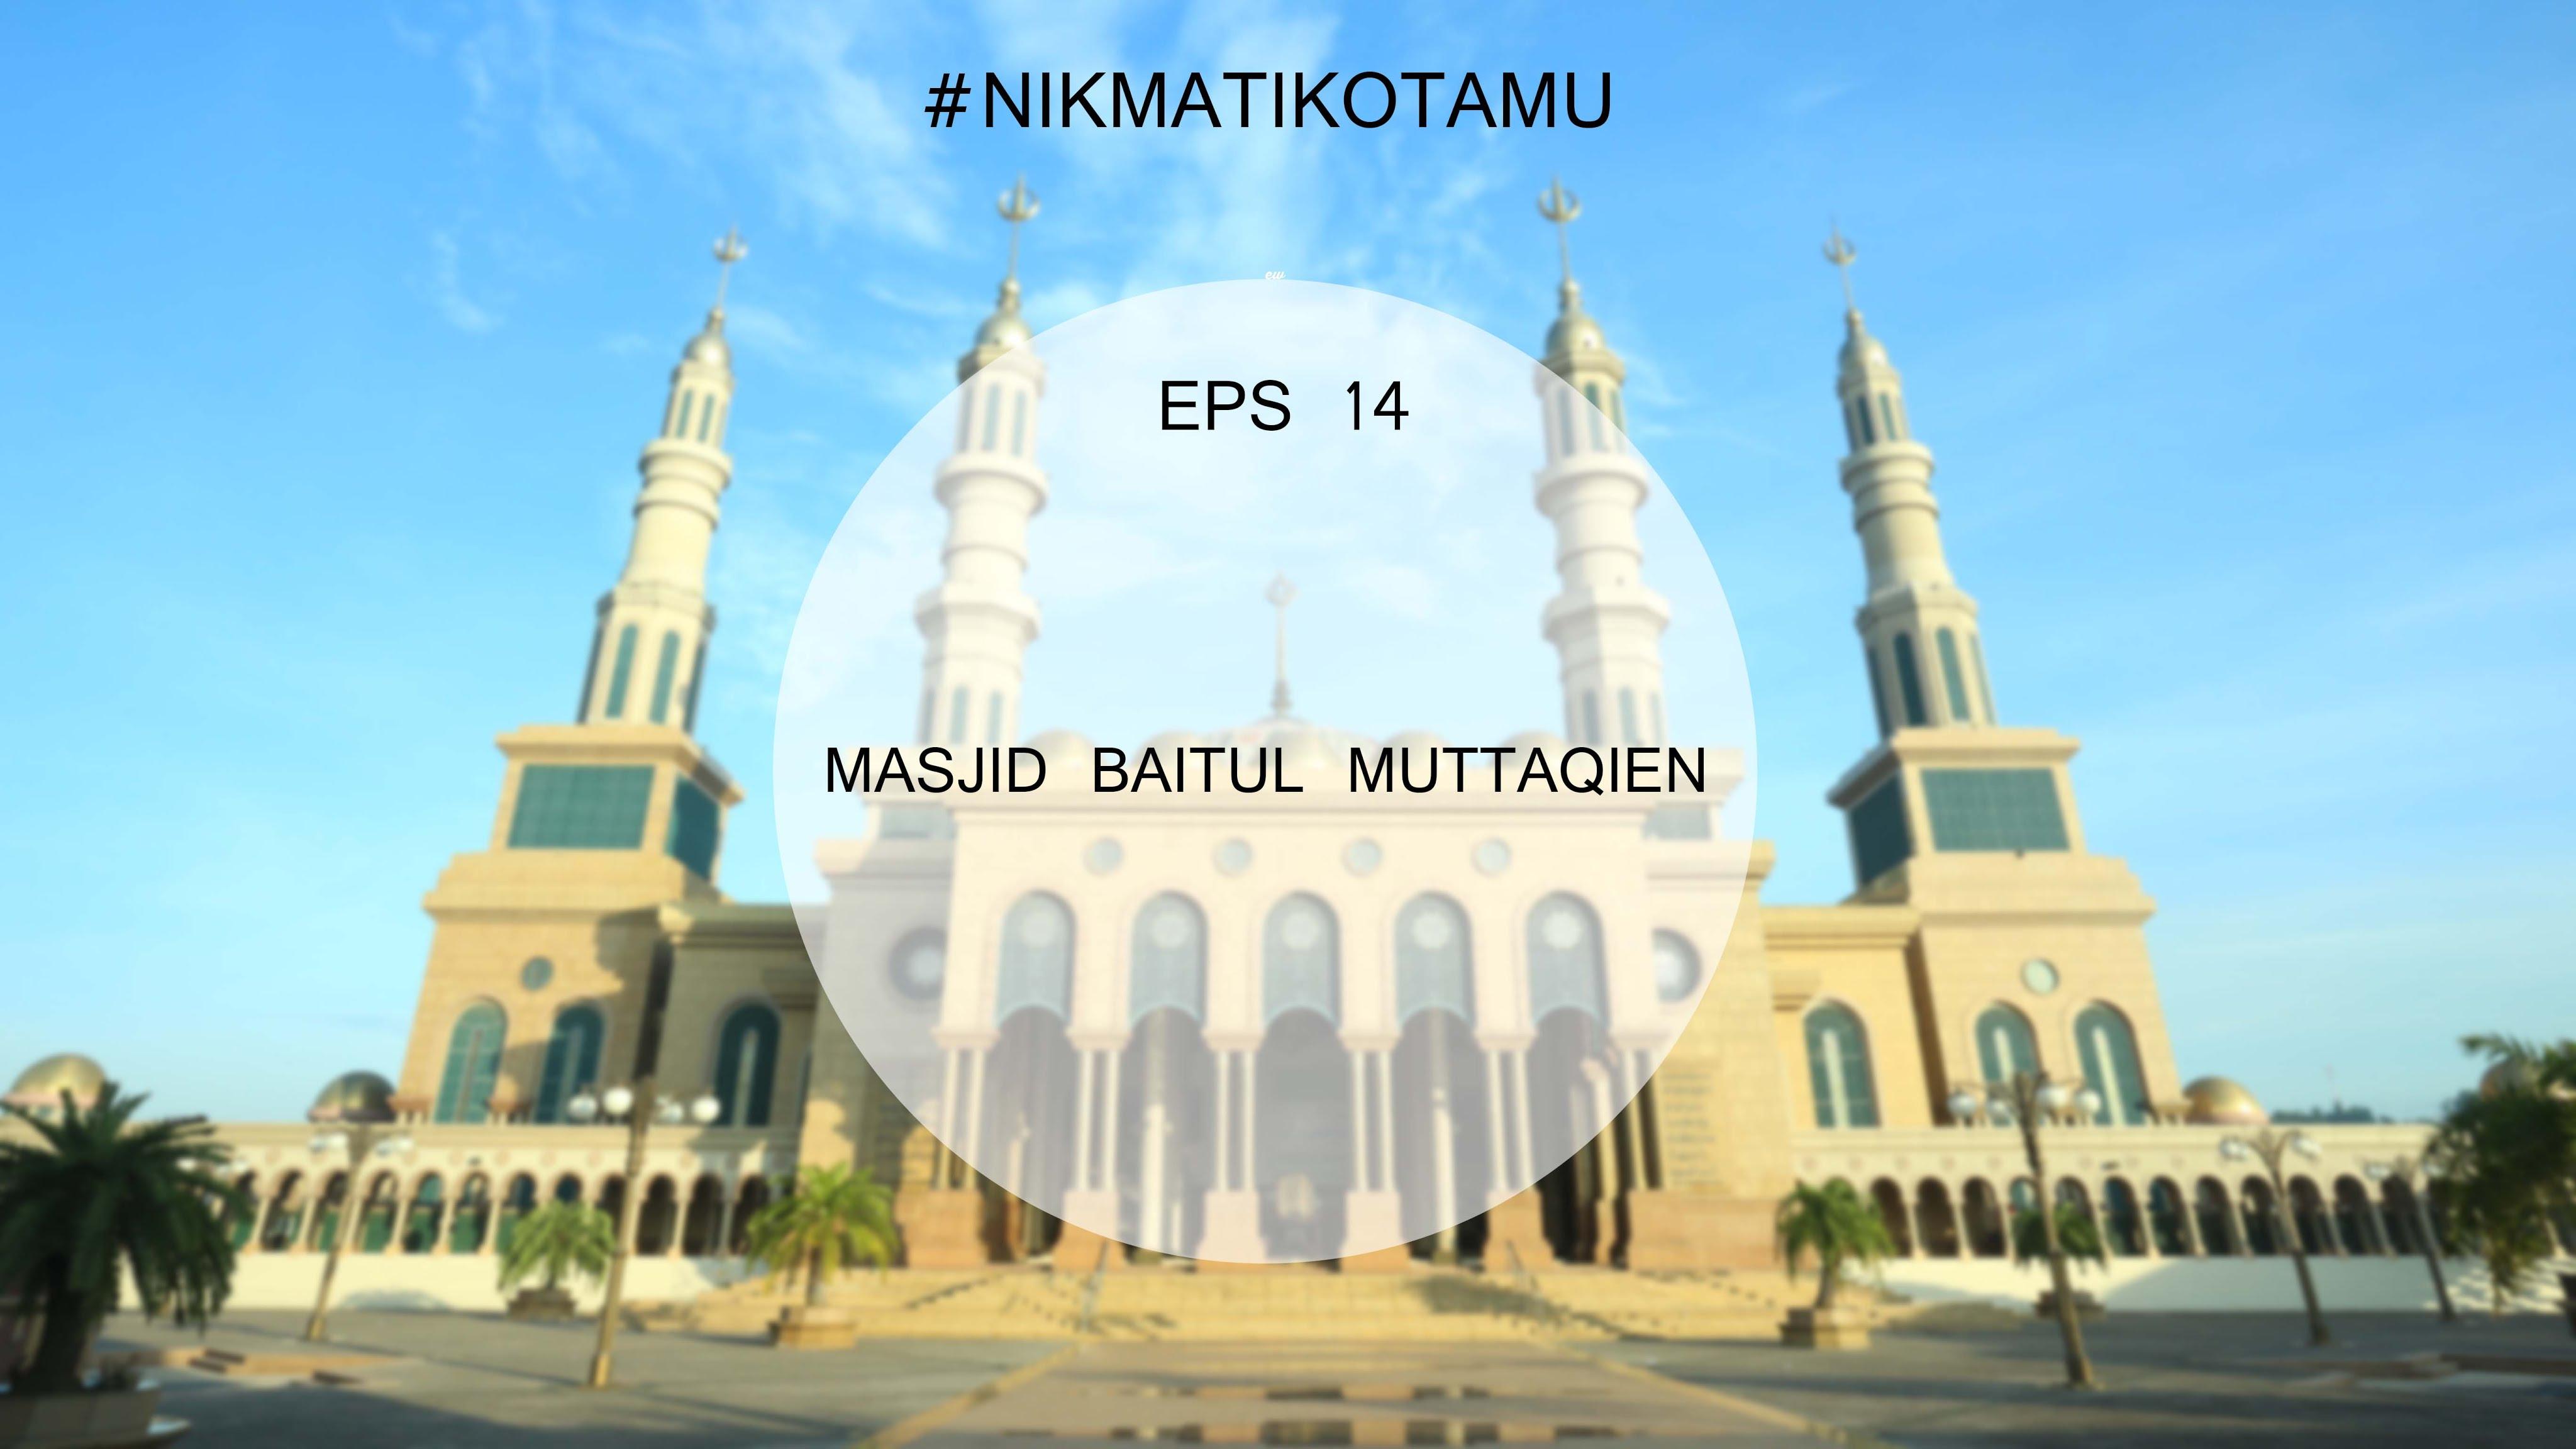 Islamic Center Samarinda Nikmatikotamu Eps 14 Youtube Masjid Baitul Muttaqien